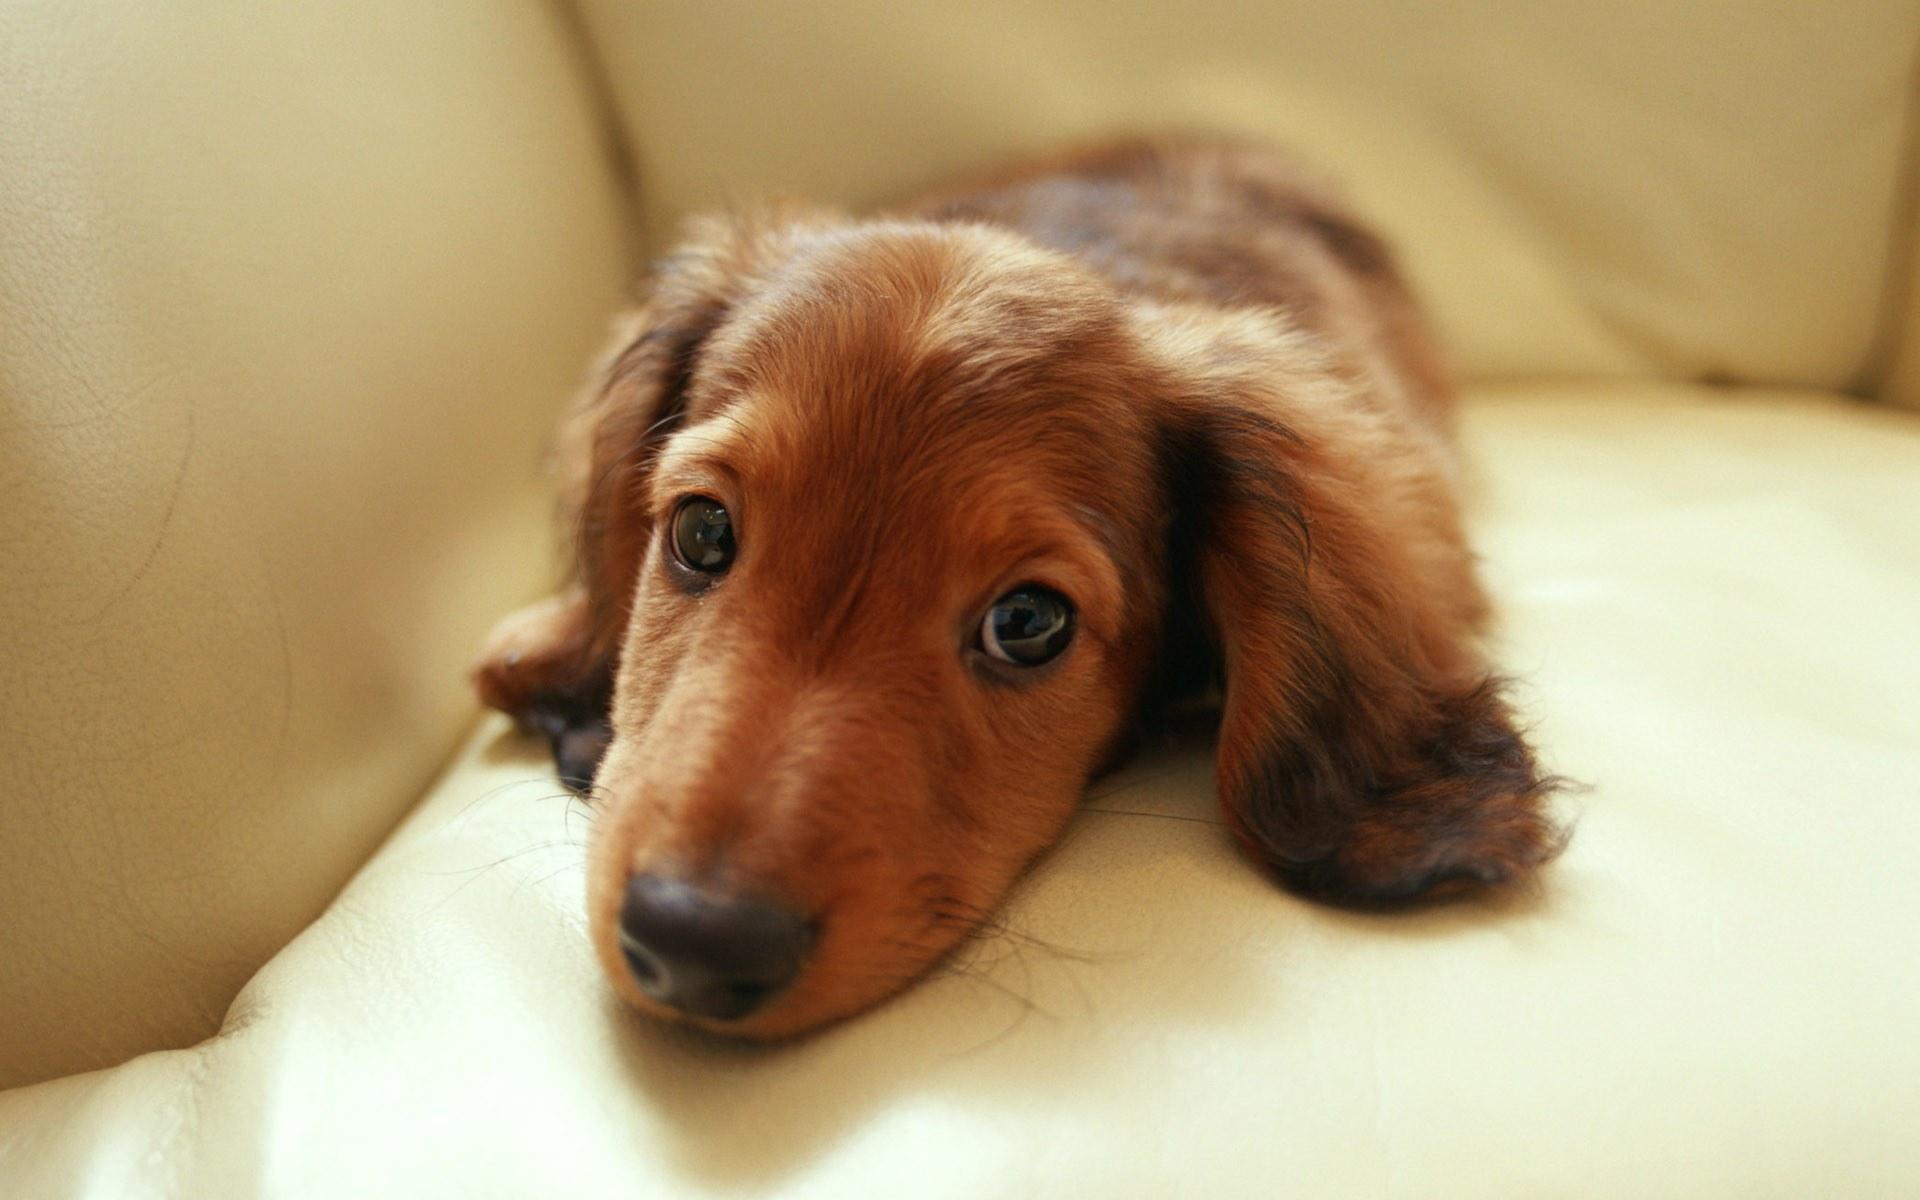 Dachshund Puppies: Dachshund Miniaturedachshundvolfc Breed